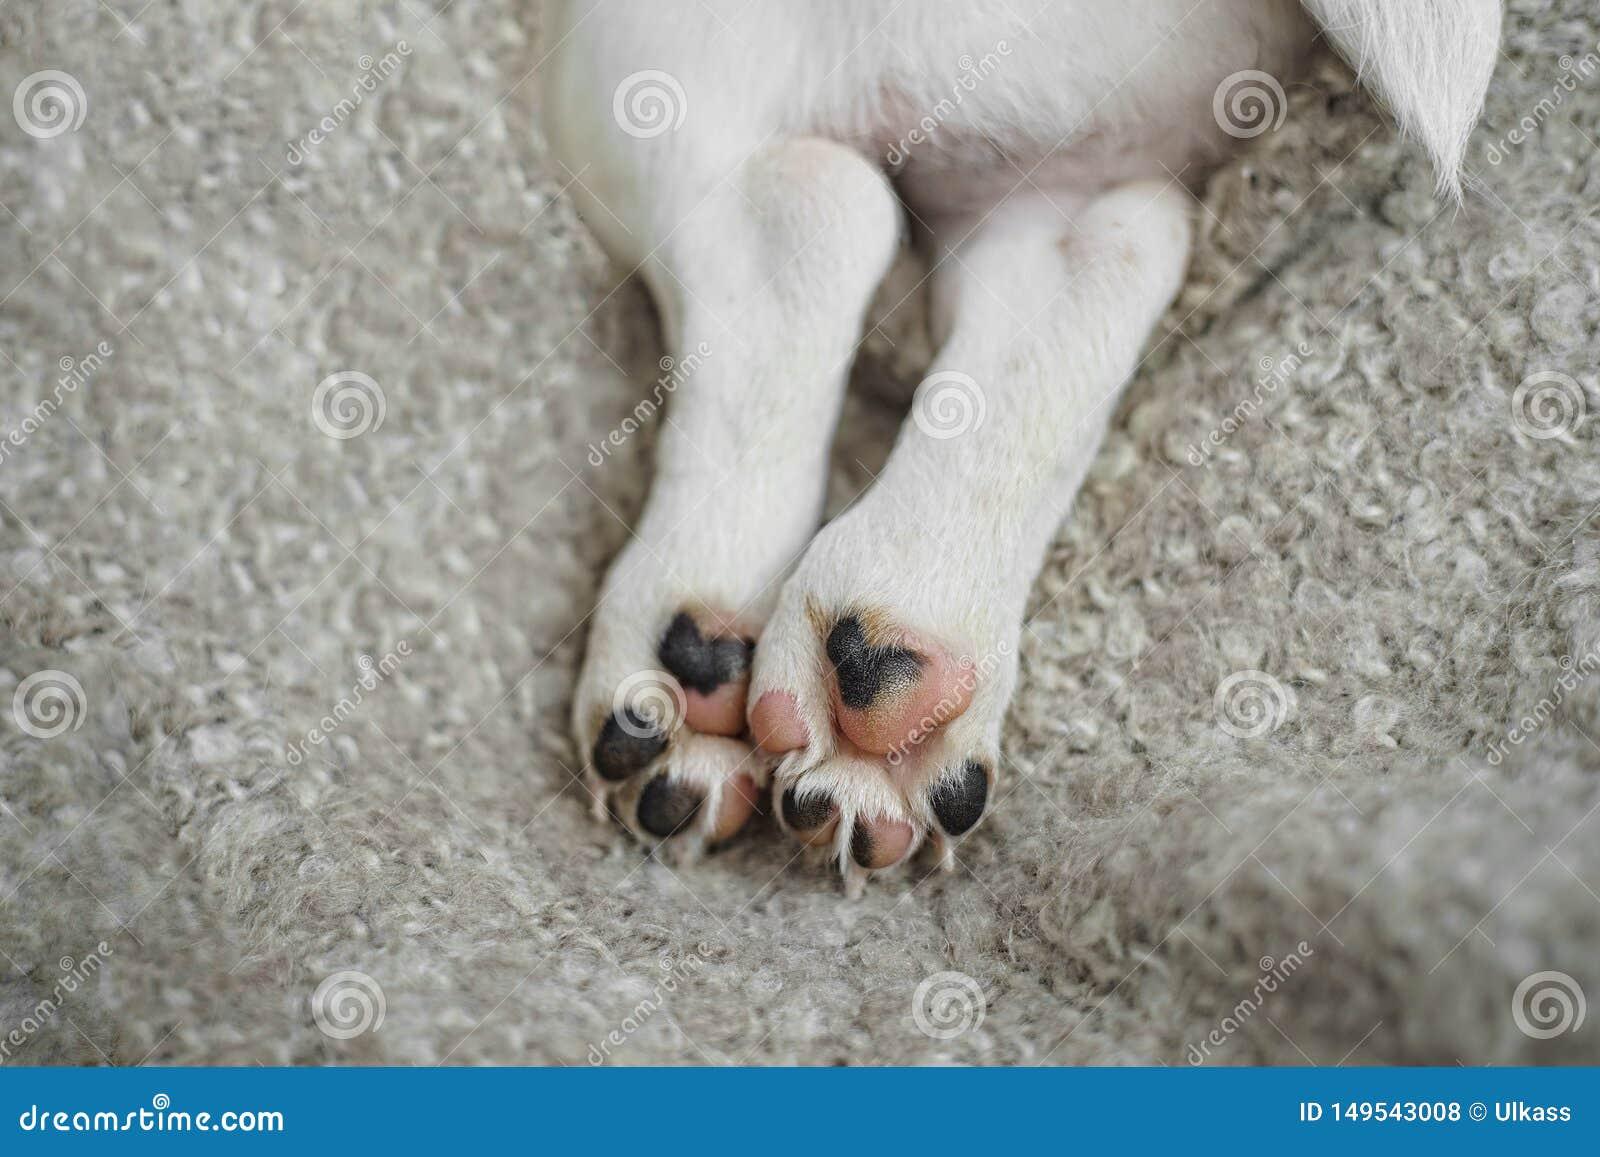 Staart, poten, leuke puppyhond op woldeken